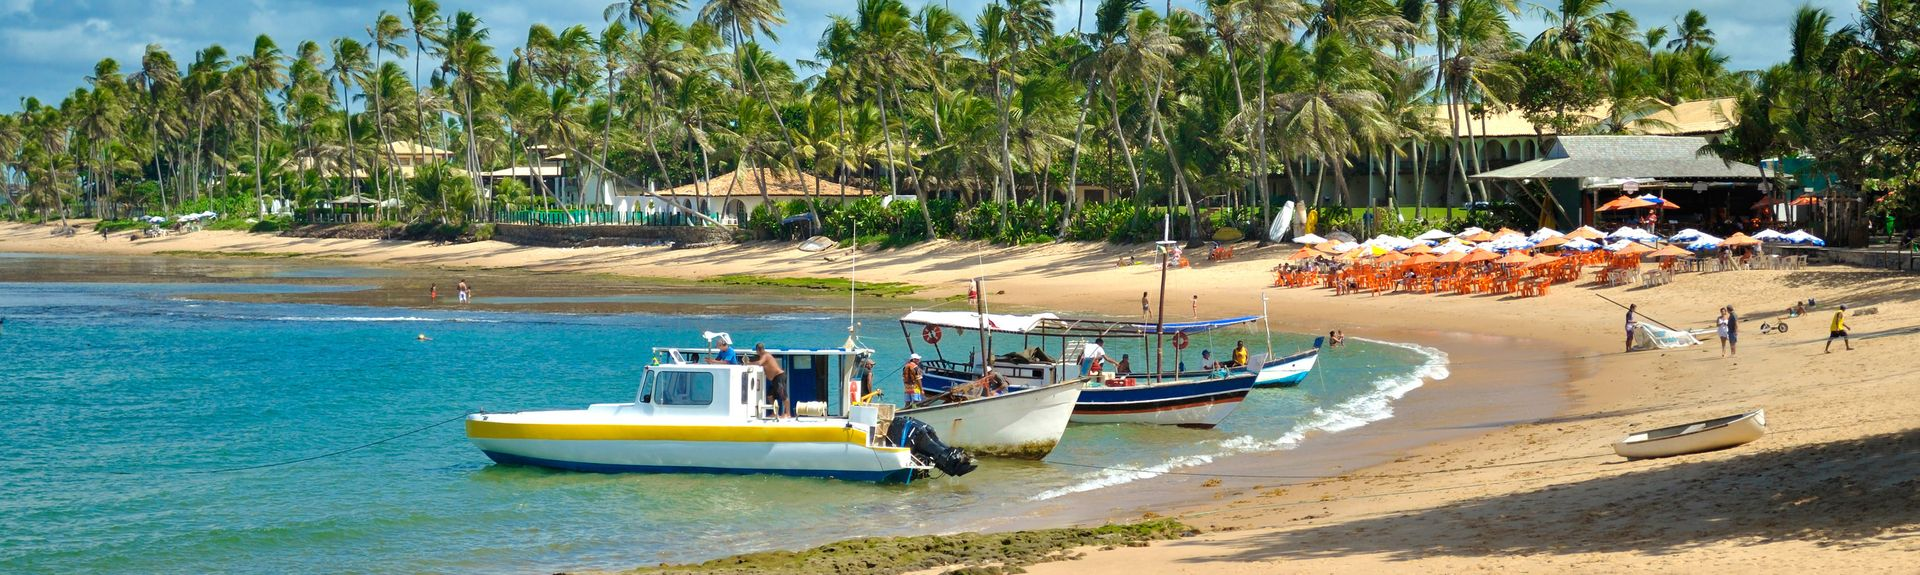 Praia do Forte, State of Bahia, Brazil